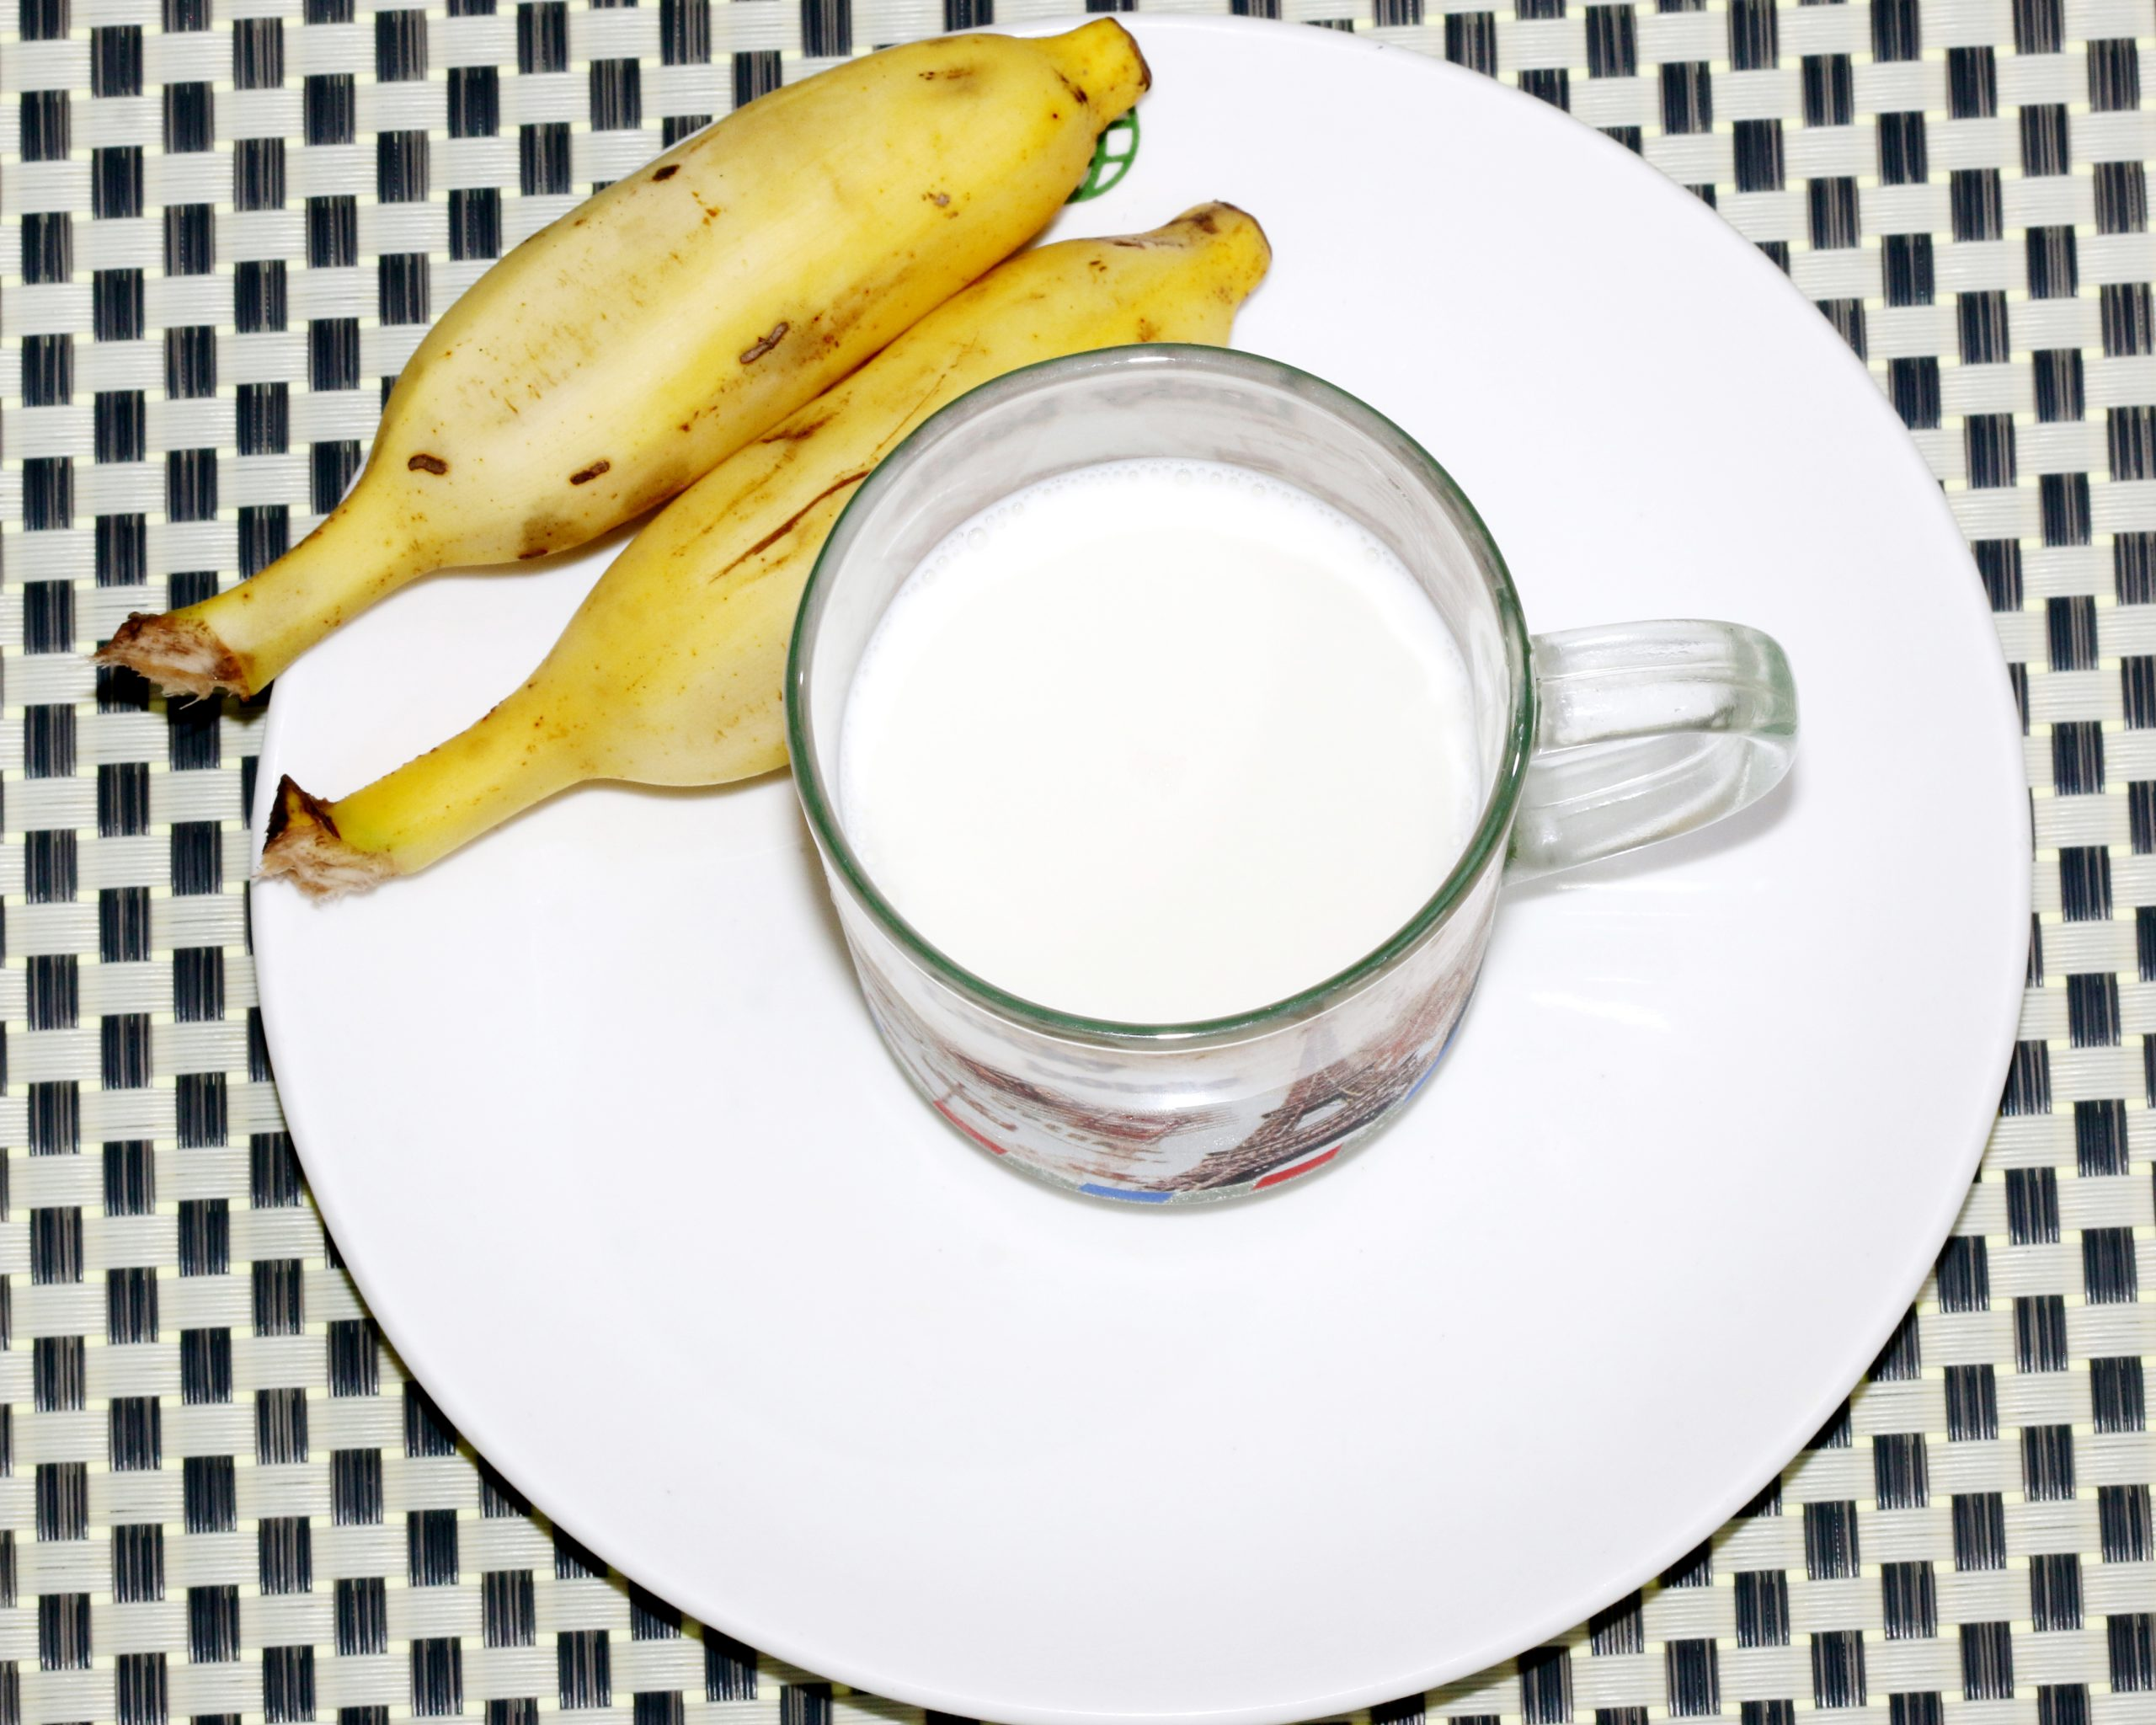 milk and bananas